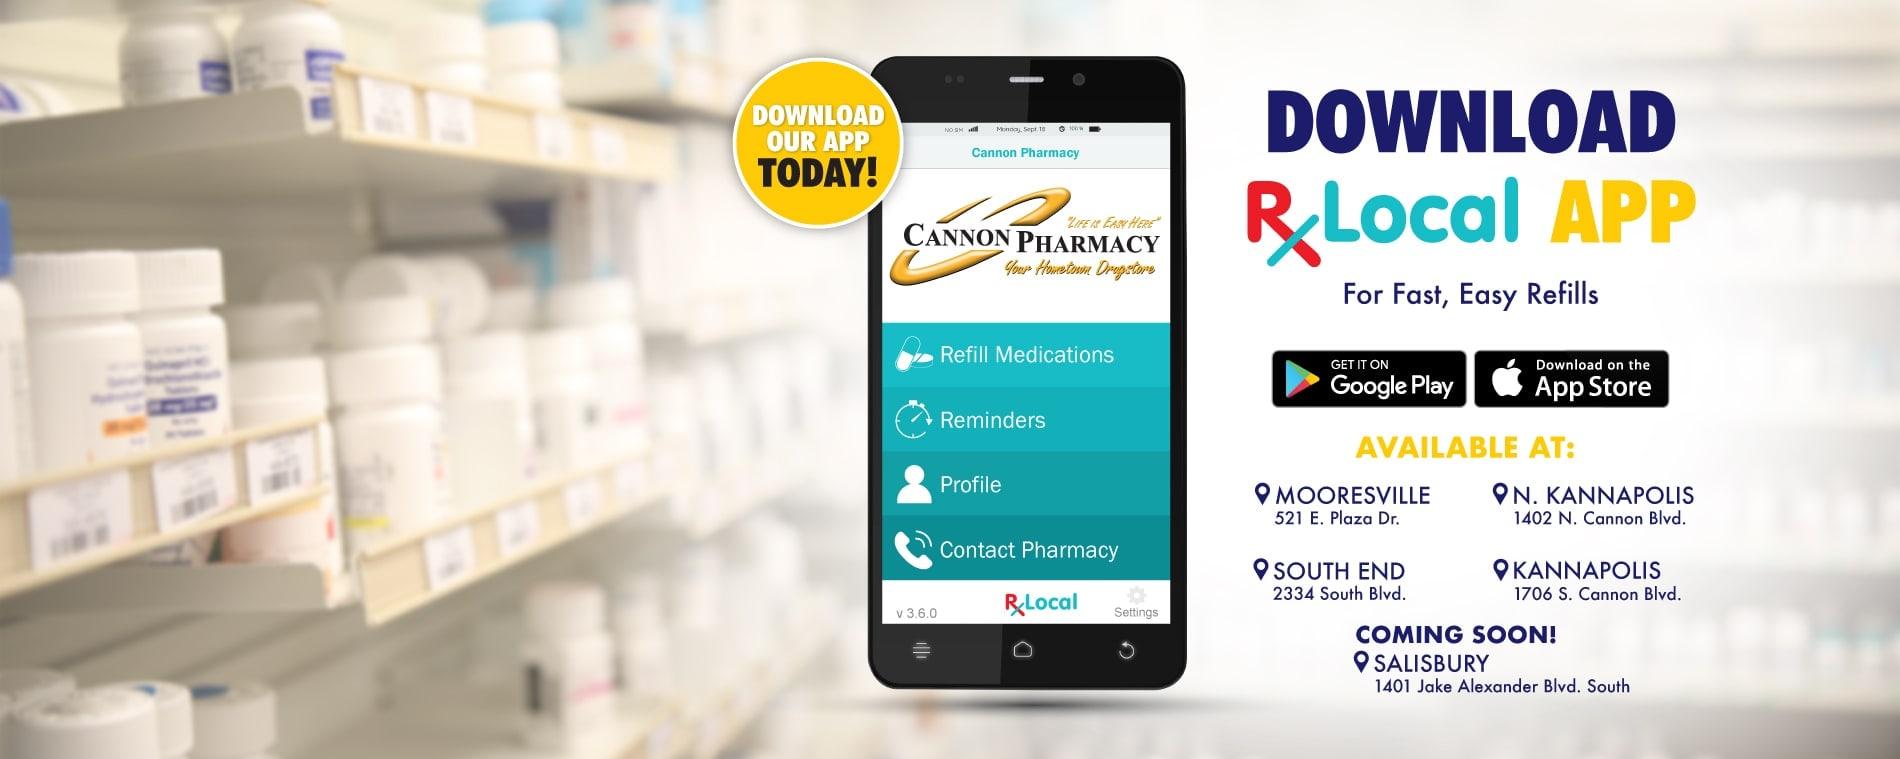 download rx local app